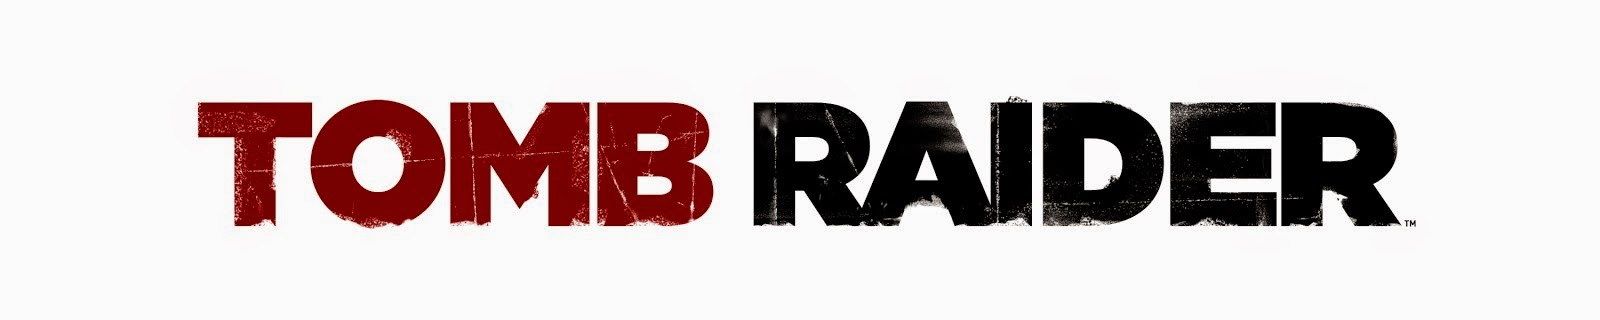 TOMB RAIDER 2013 - REBORN